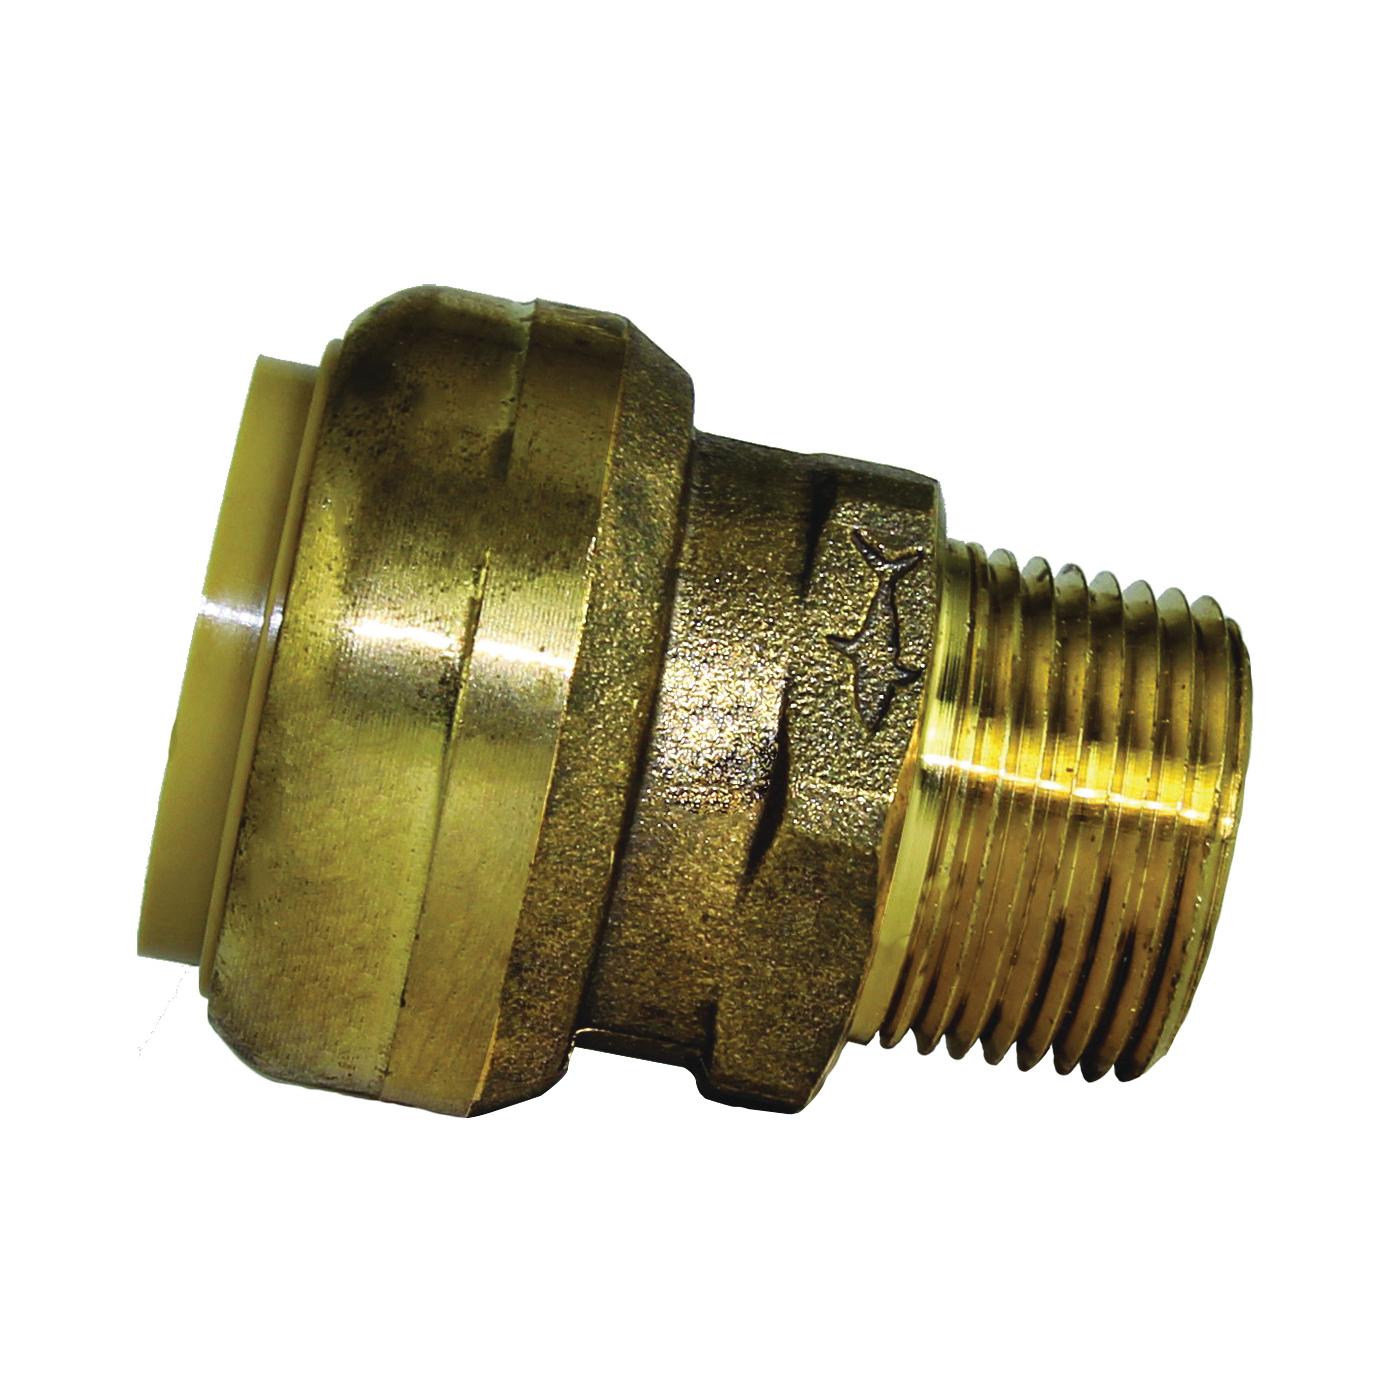 Picture of SharkBite U142LFA Pipe Connector, 1 x 3/4 in, MNPT x MNPT, Brass, 200 psi Pressure